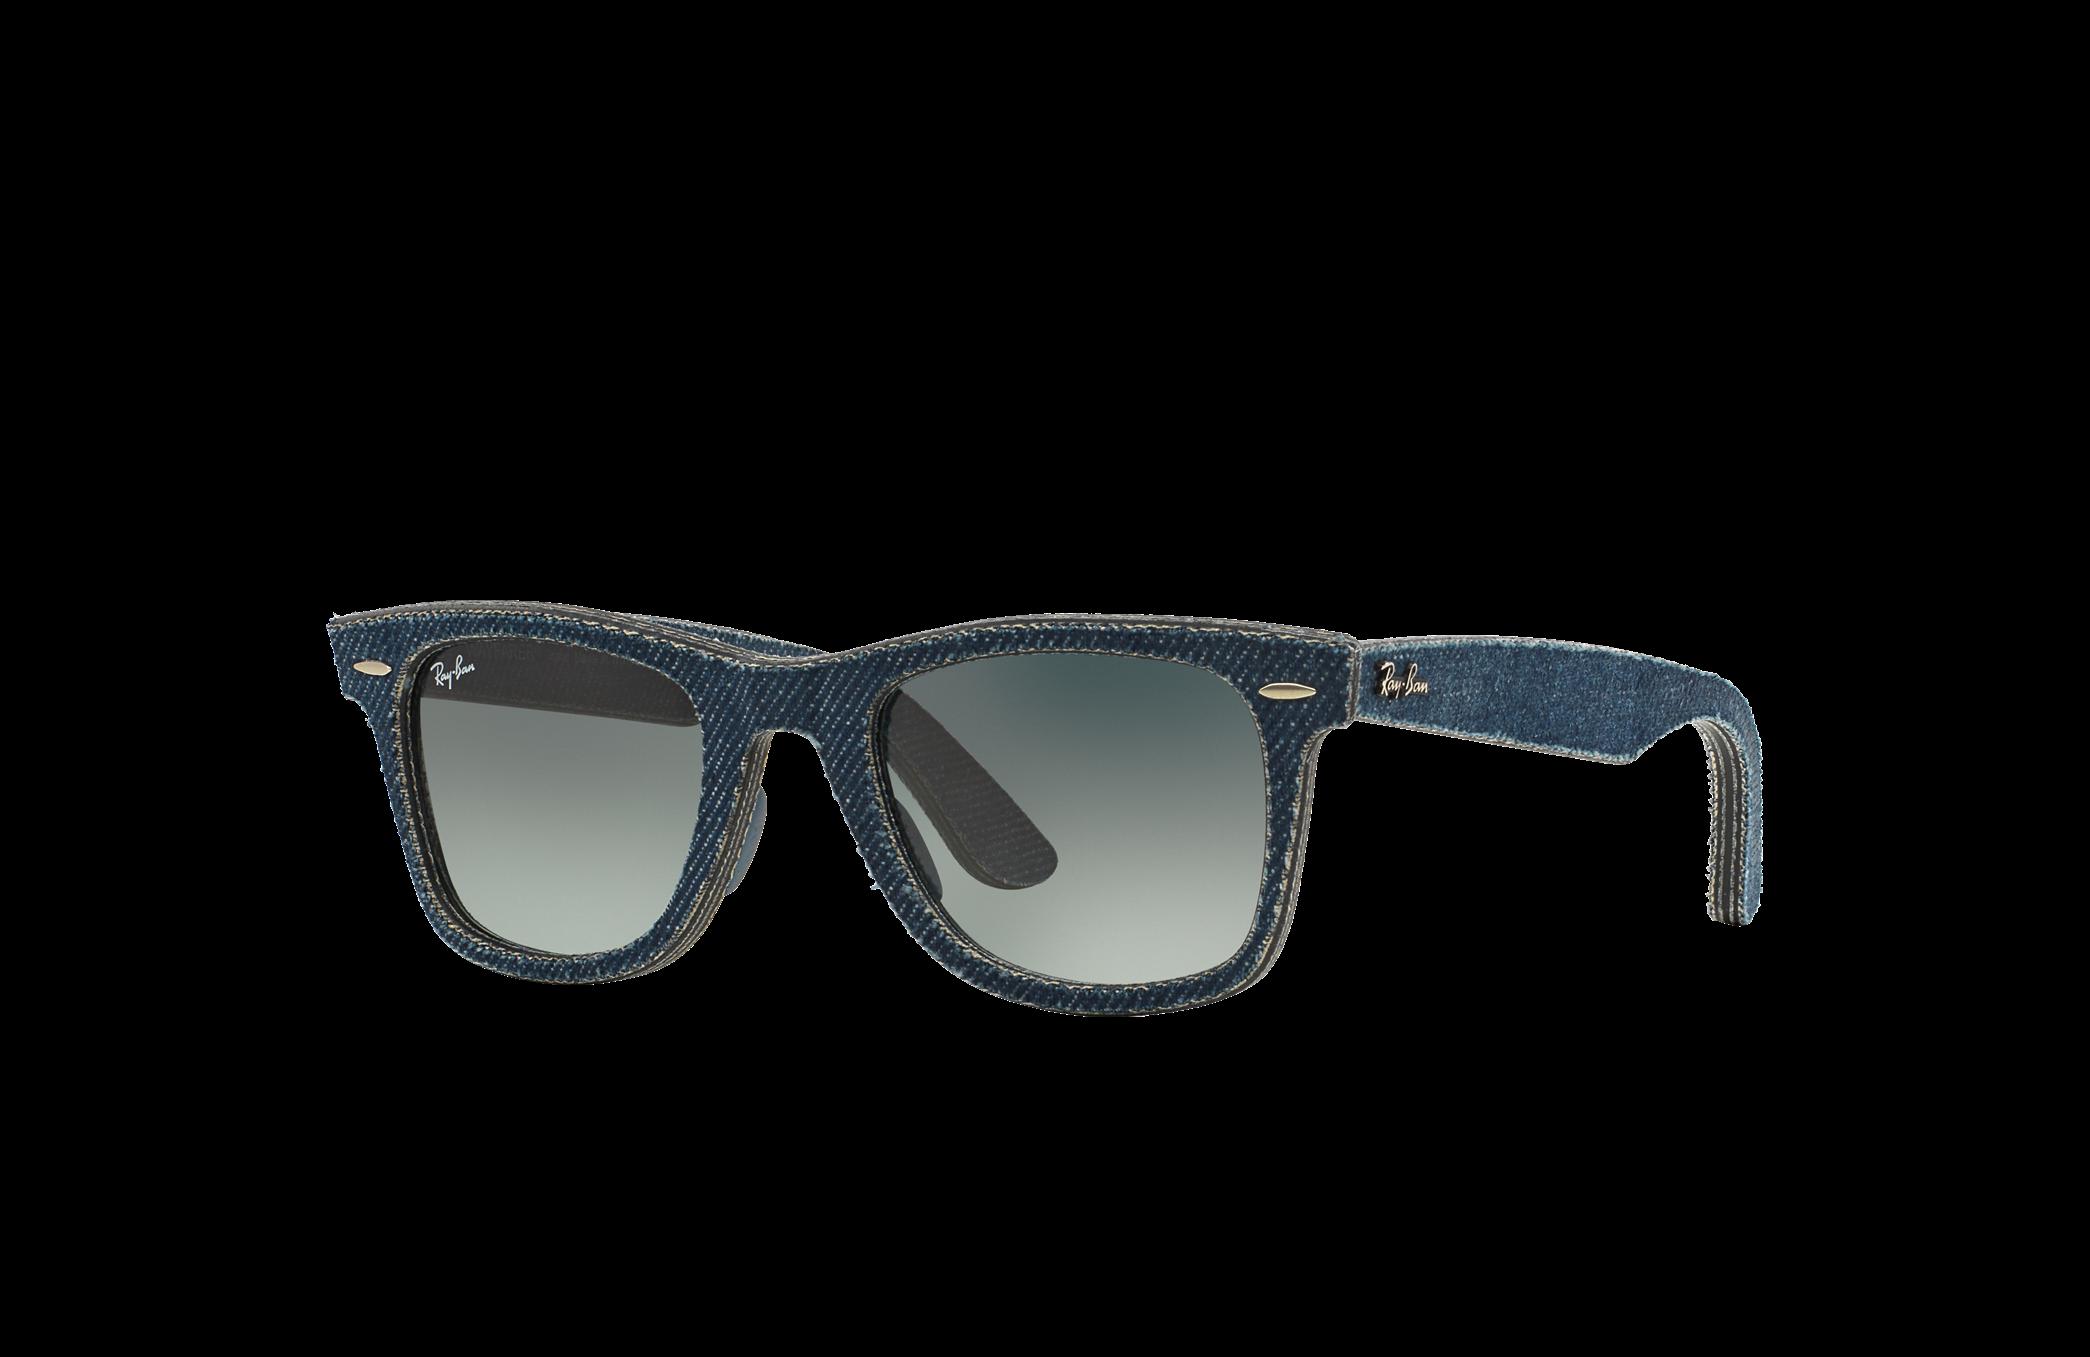 Ray-Ban Original Wayfarer Denim Blue, Gray Lenses - RB2140